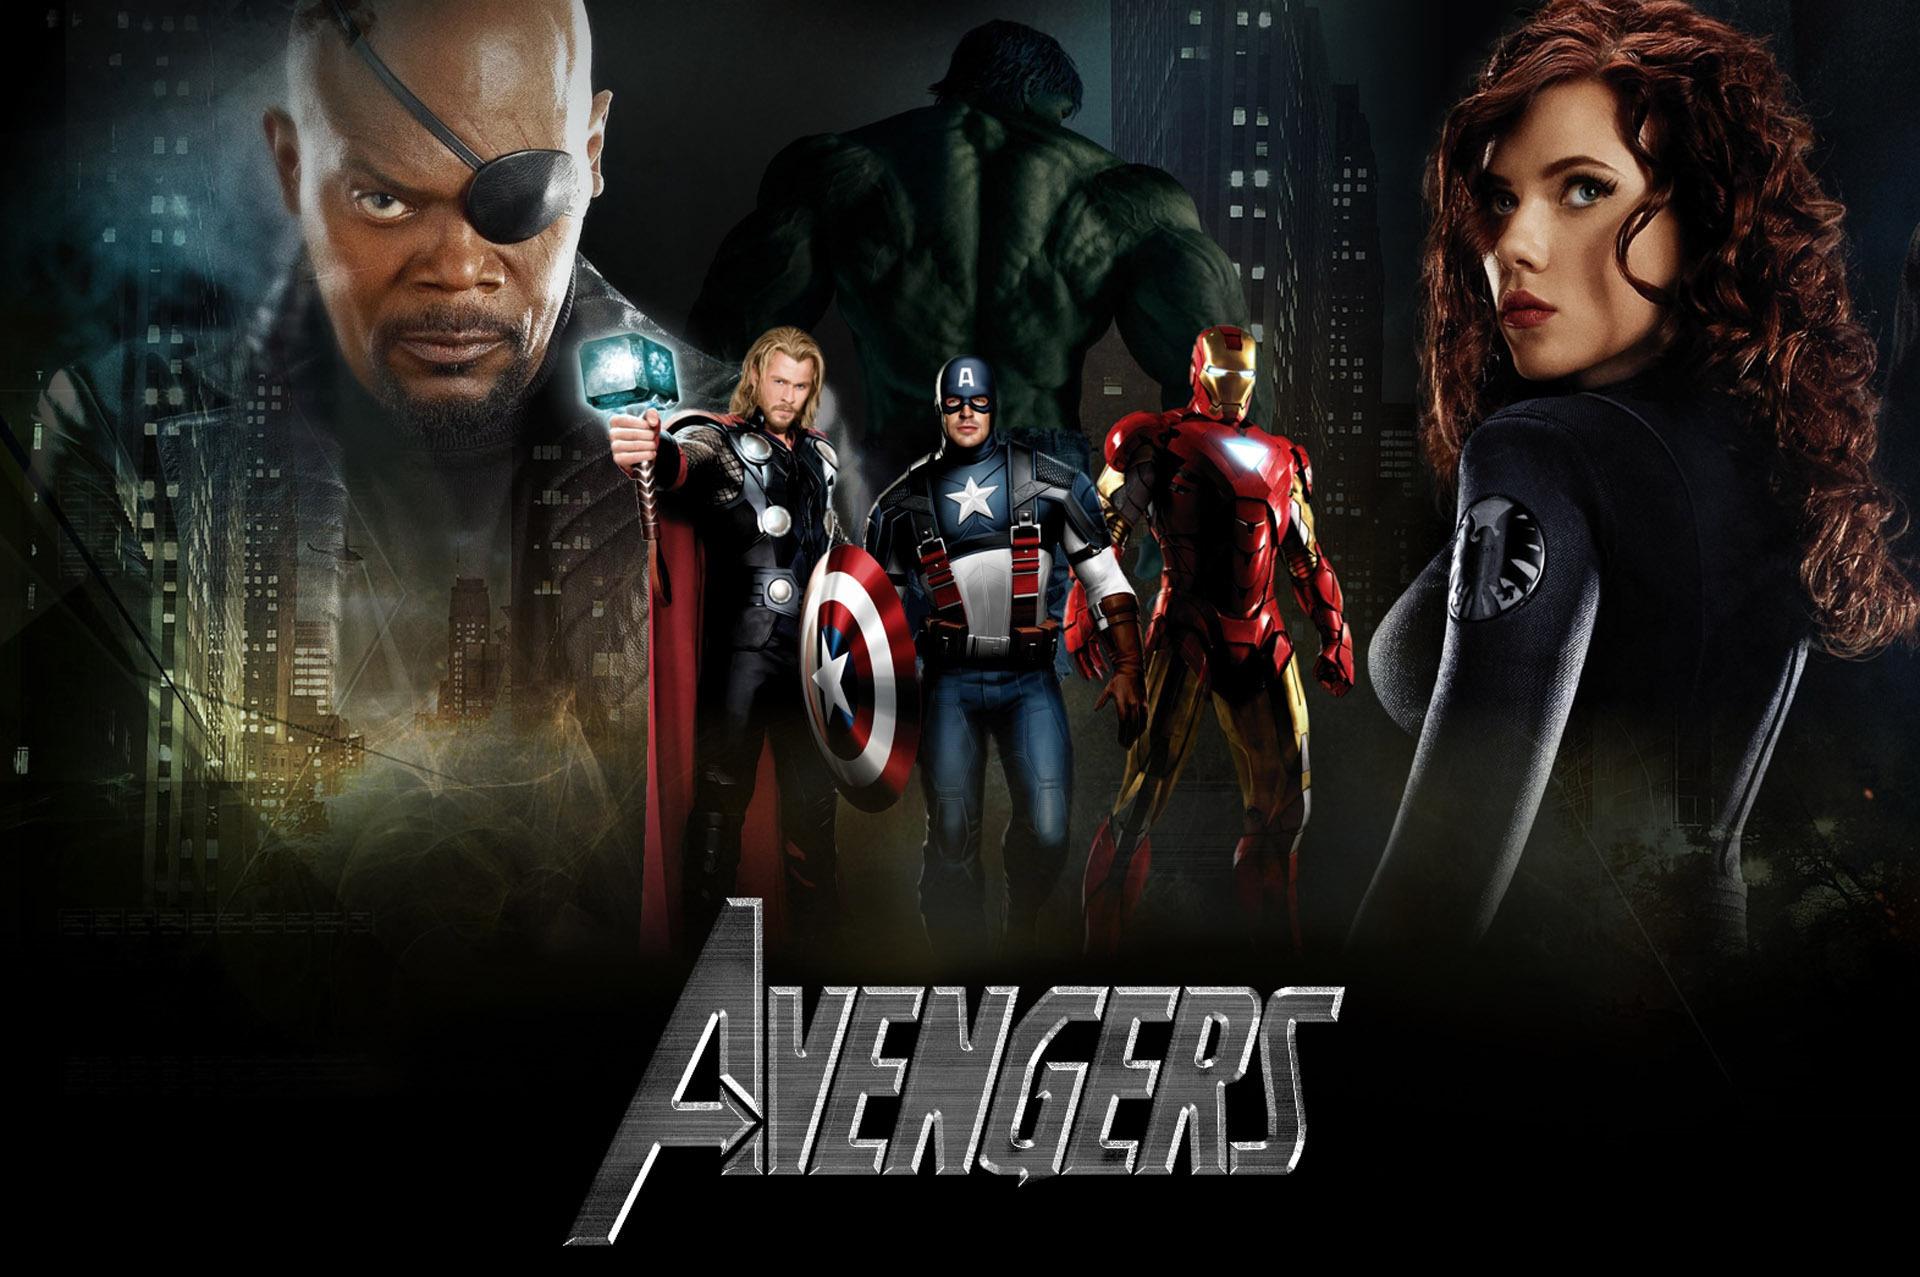 Avengers fonds d 39 cran arri res plan 1920x1277 id 261282 - Telecharger avengers ...